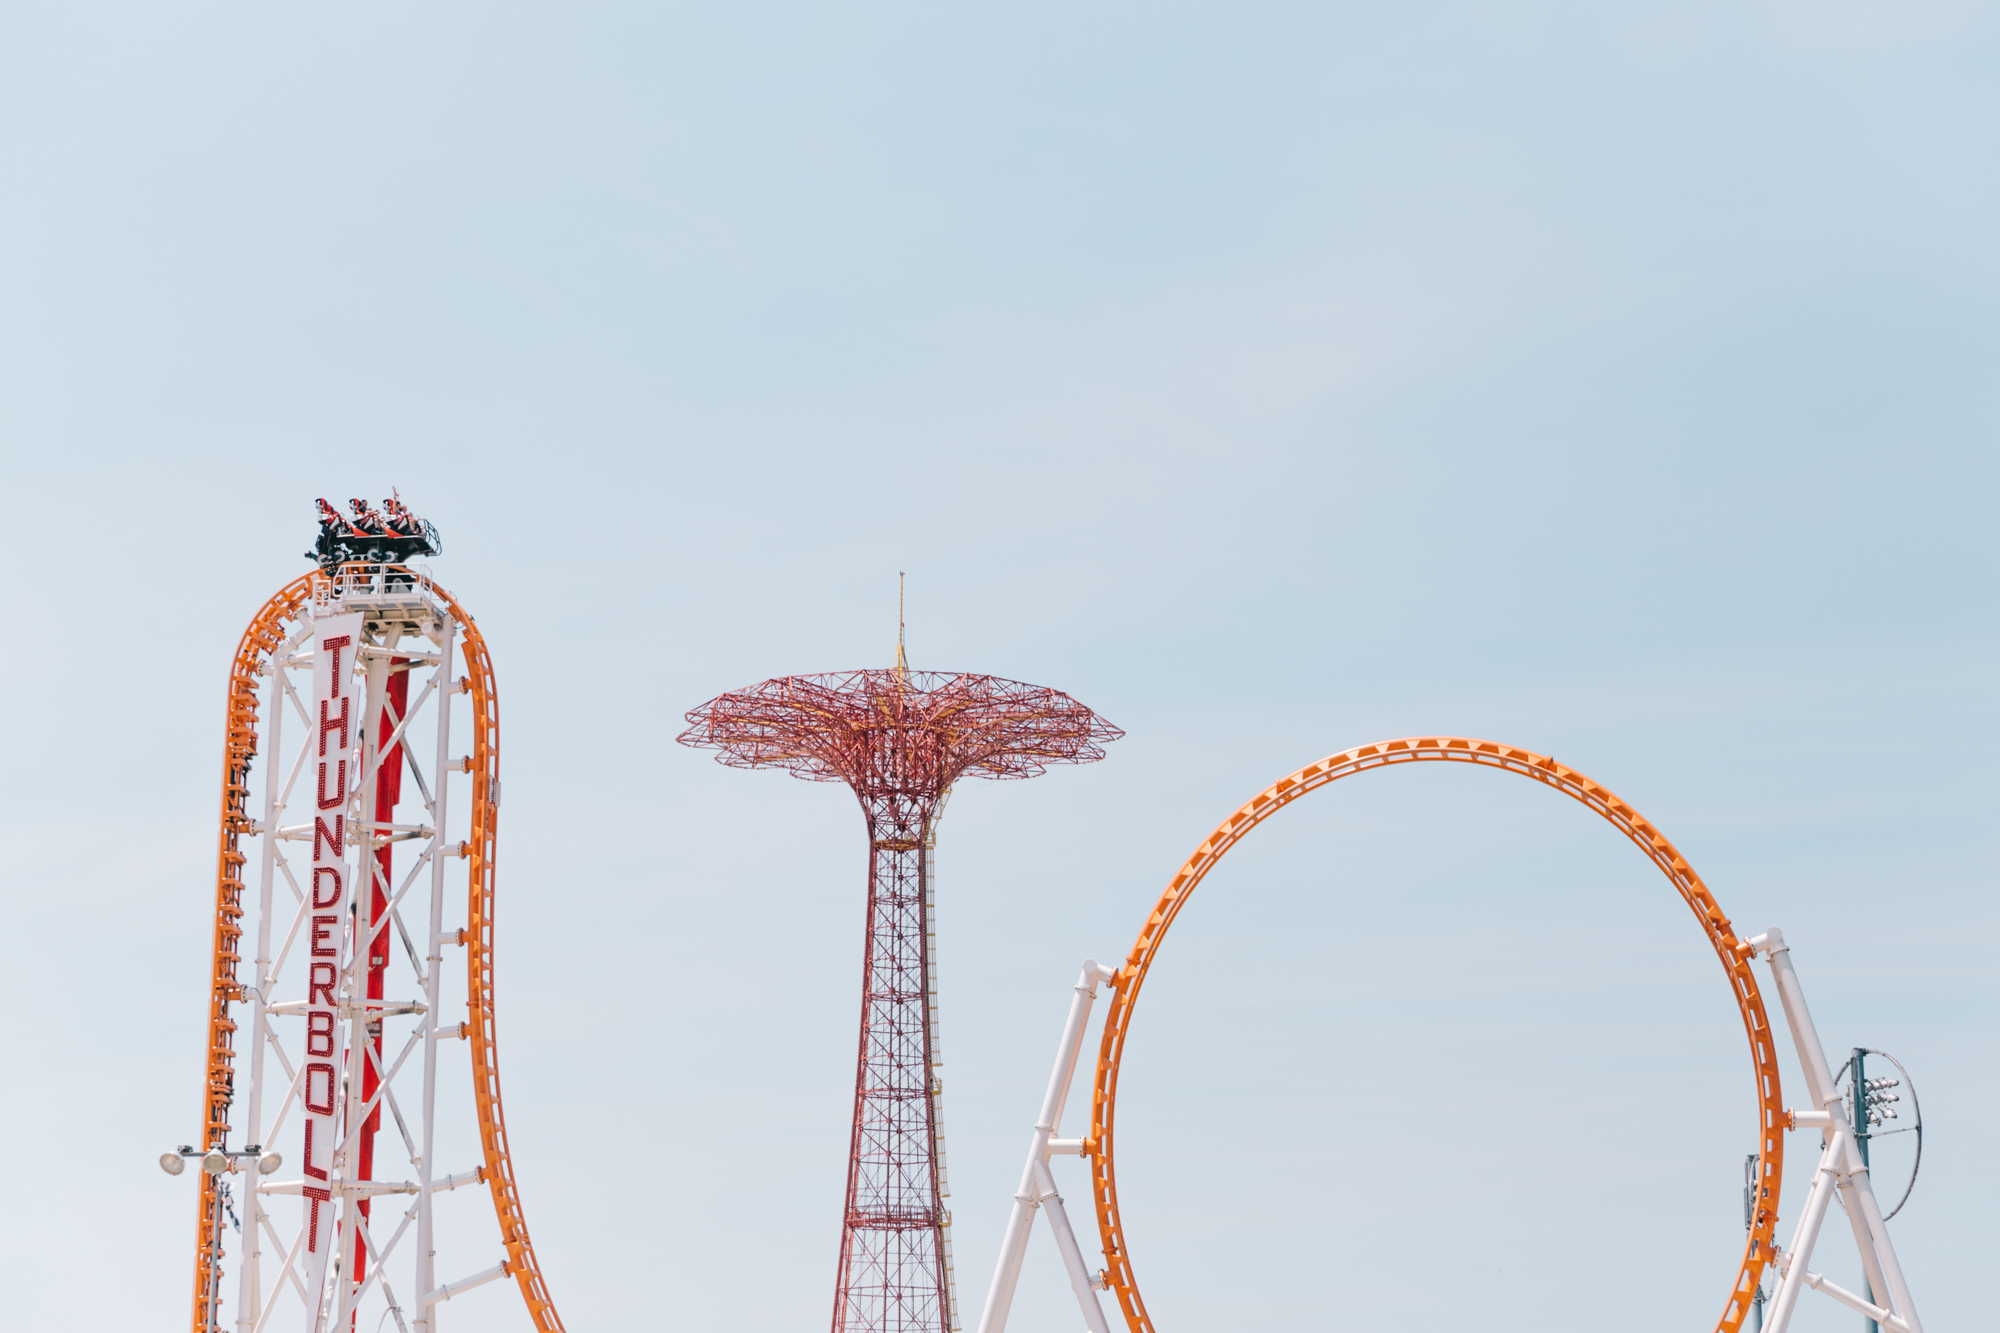 Coney_Island_NYC_4thJuly_DaniellePhotographySA17.jpg